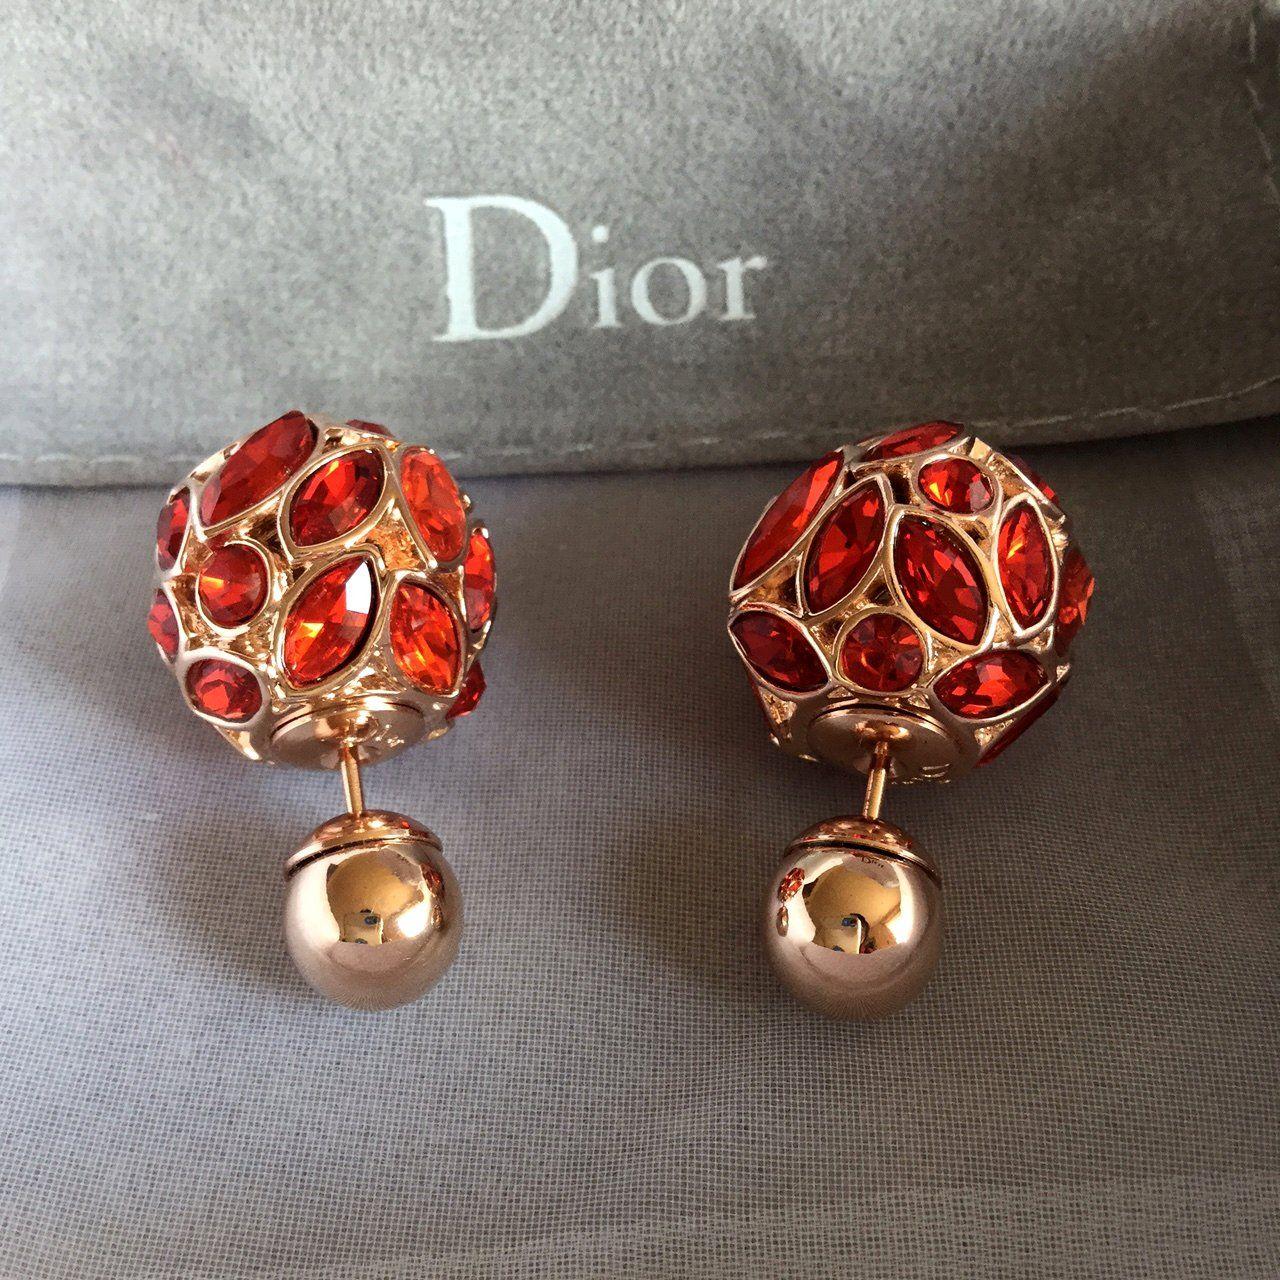 cfcae75c8b37a4 DIOR+TRIBAL+Red+Crystal+Gold+Stud+Earrings+Mise+En+Dior+Tribale+Authentic+ NIB